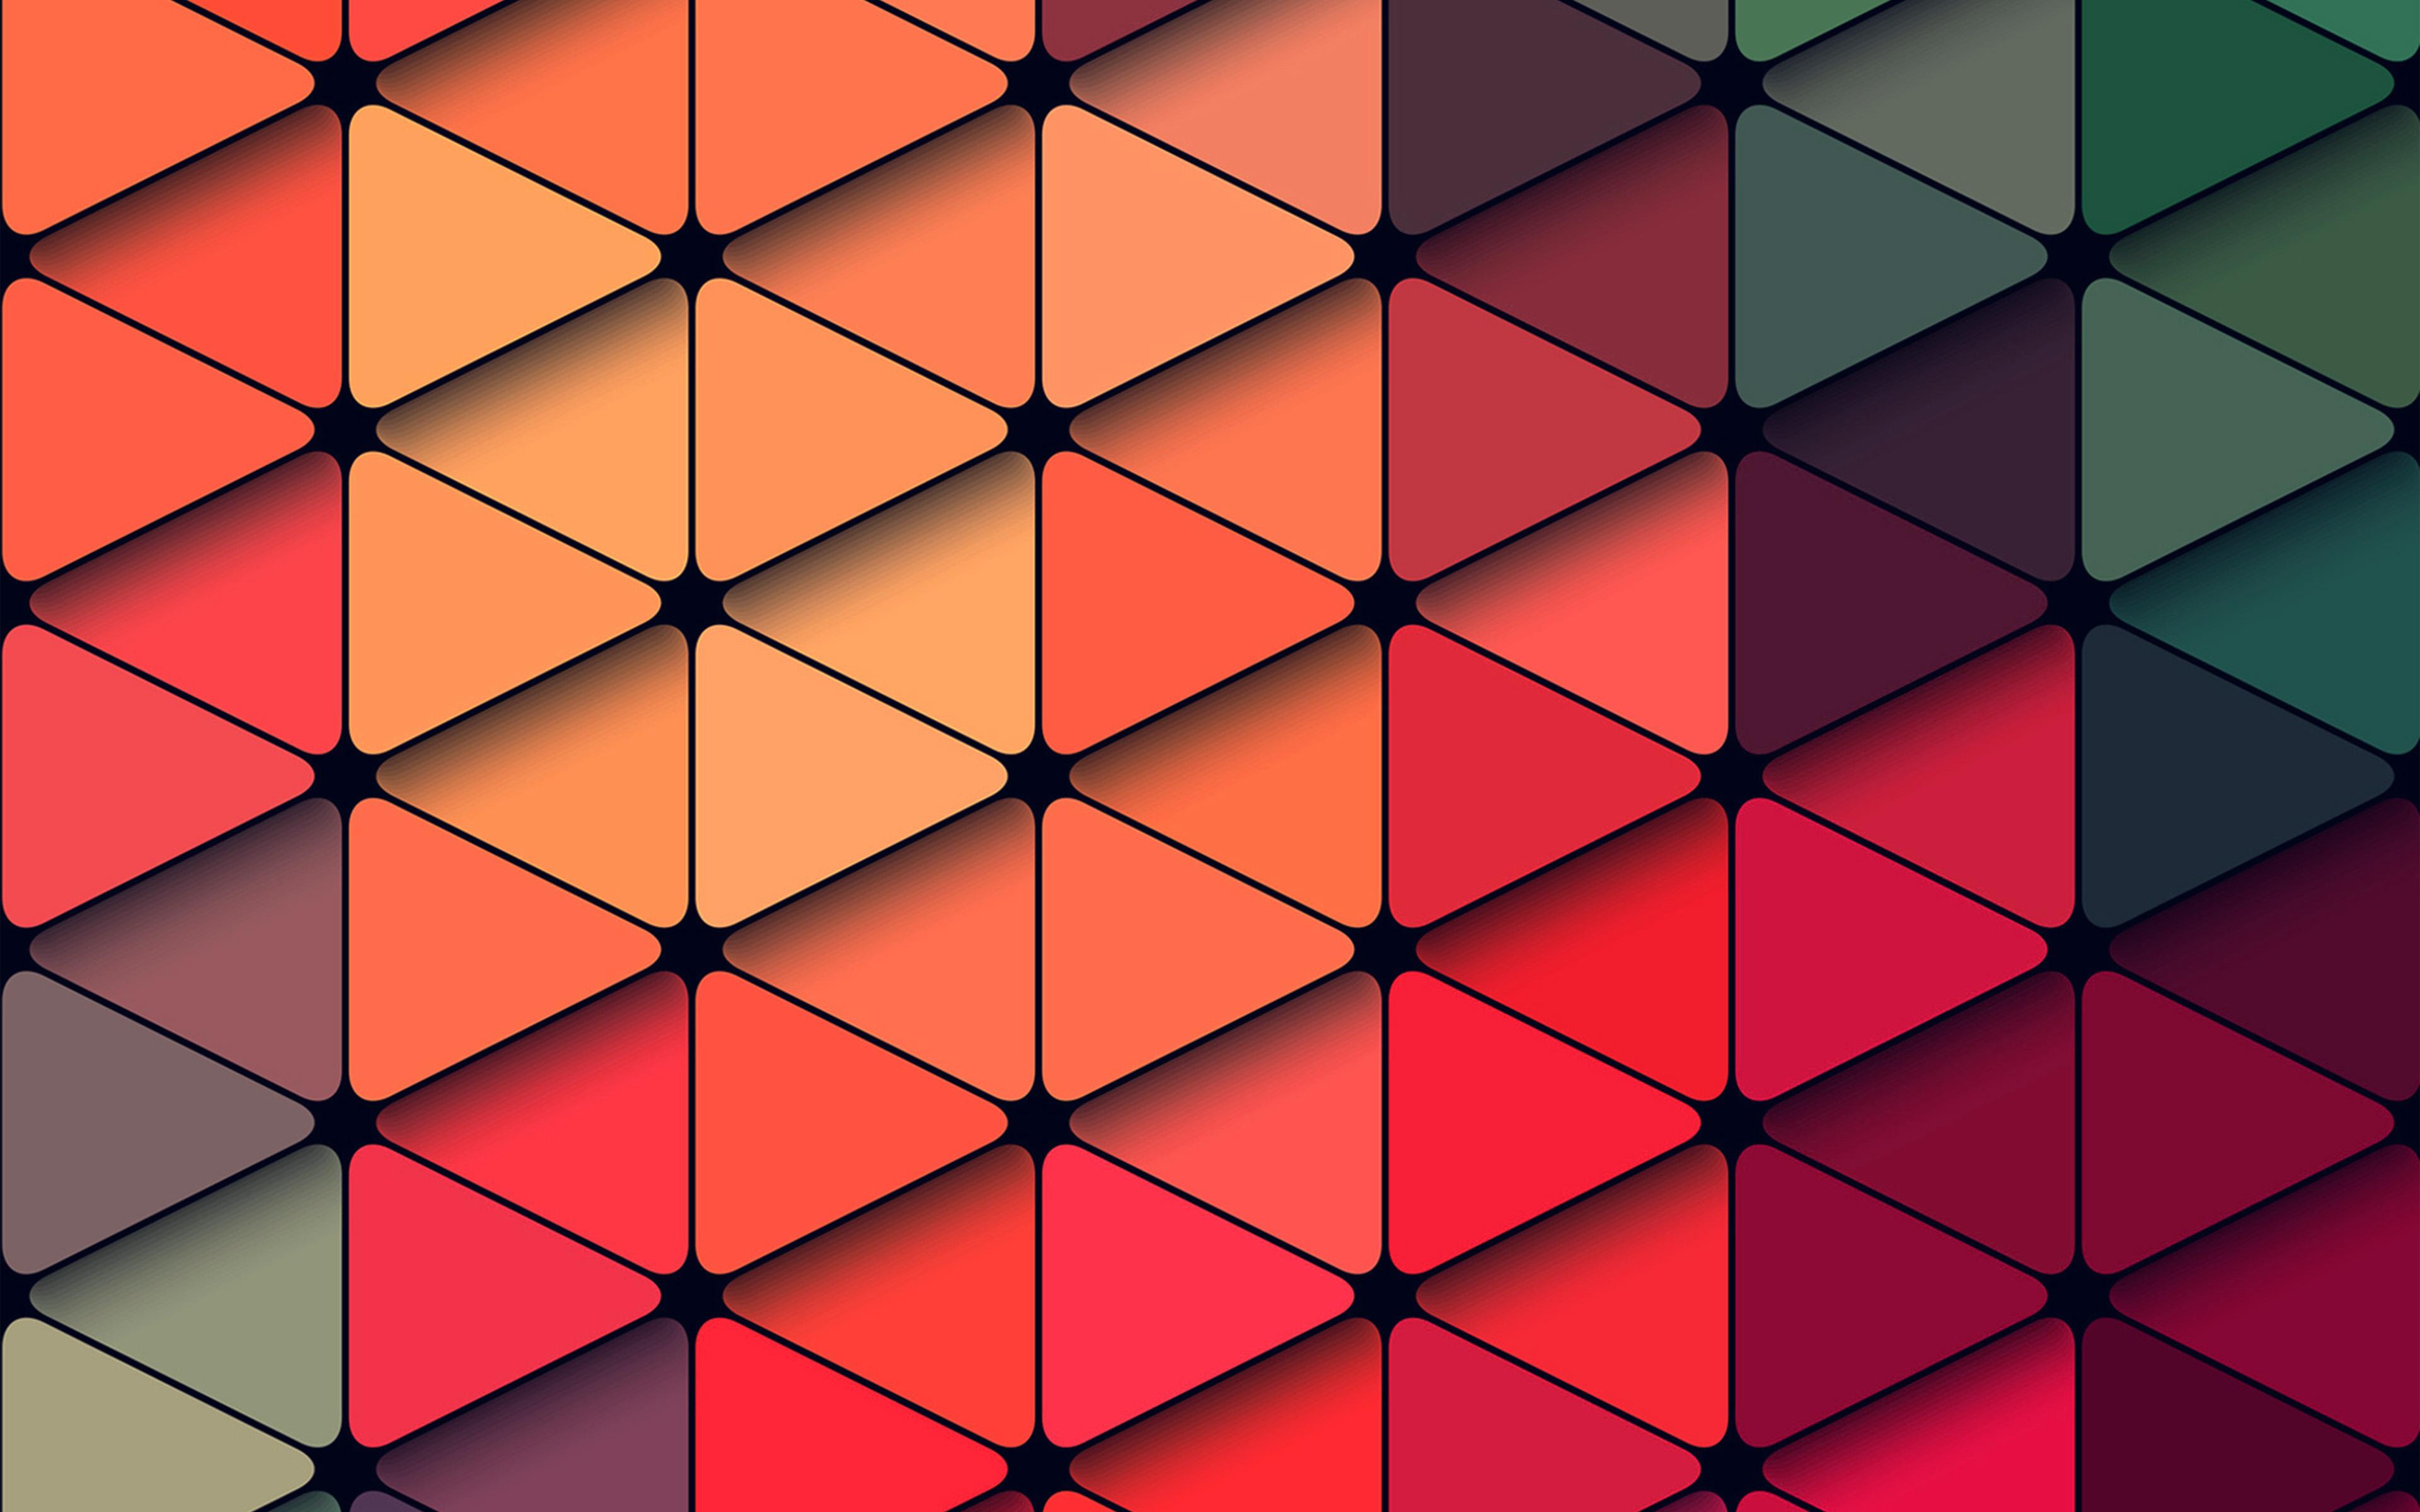 Fall Wallpaper 4k Vp93 Trainagles Rainbow Color Red Abstract Pattern Wallpaper